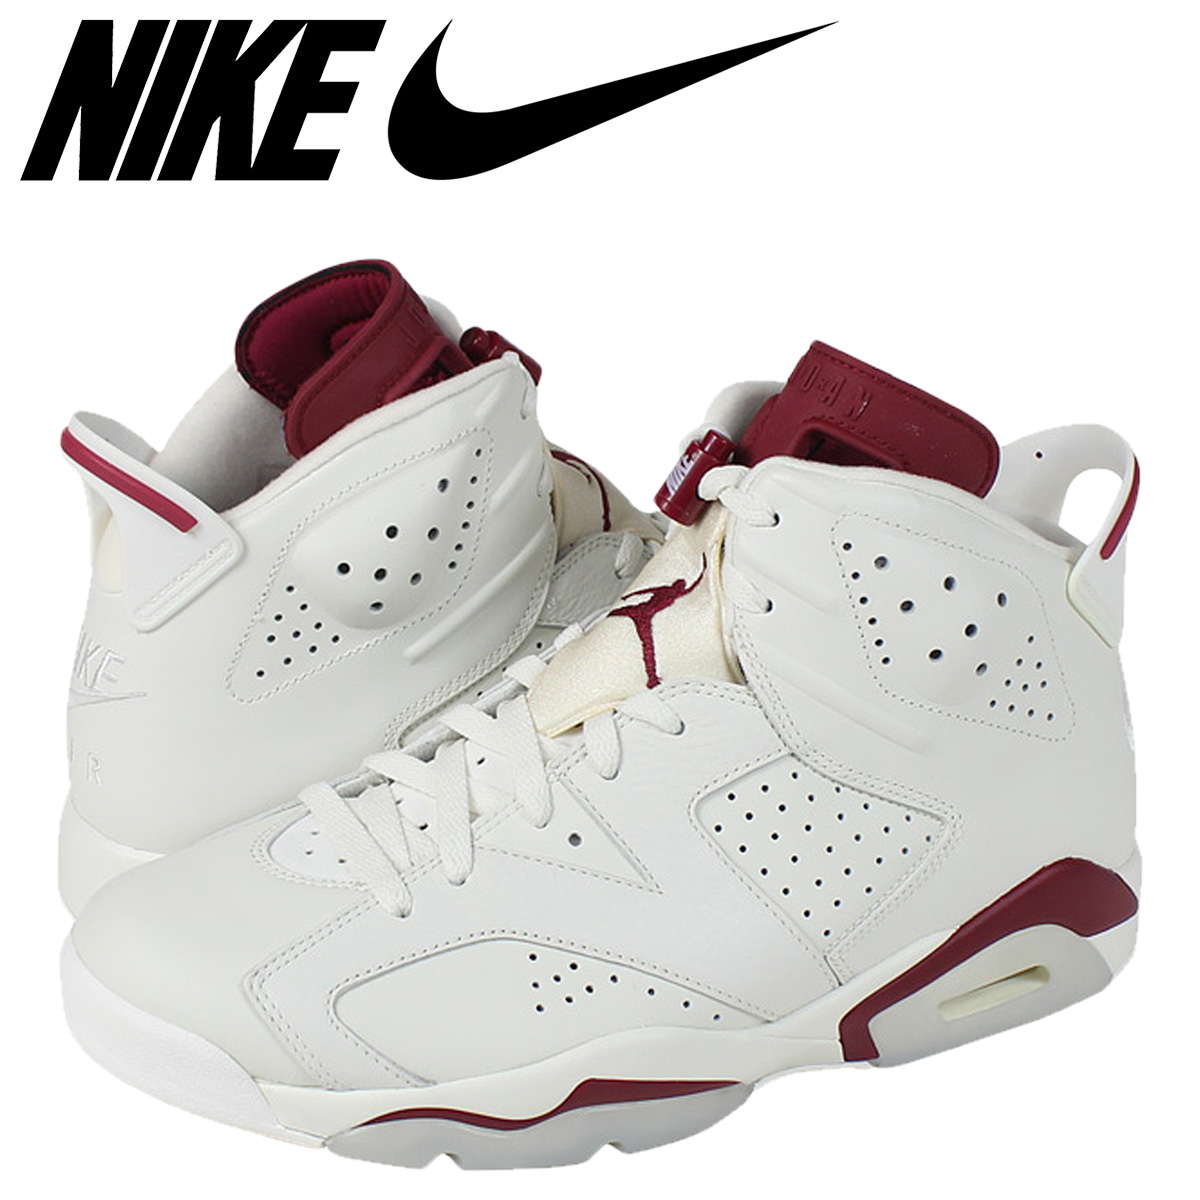 half off 5f993 7426b [SOLD OUT] Nike NIKE Air Jordan sneakers AIR JORDAN 6 RETRO MAROON Air  Jordan 6 retro 384664 - 116 off white men